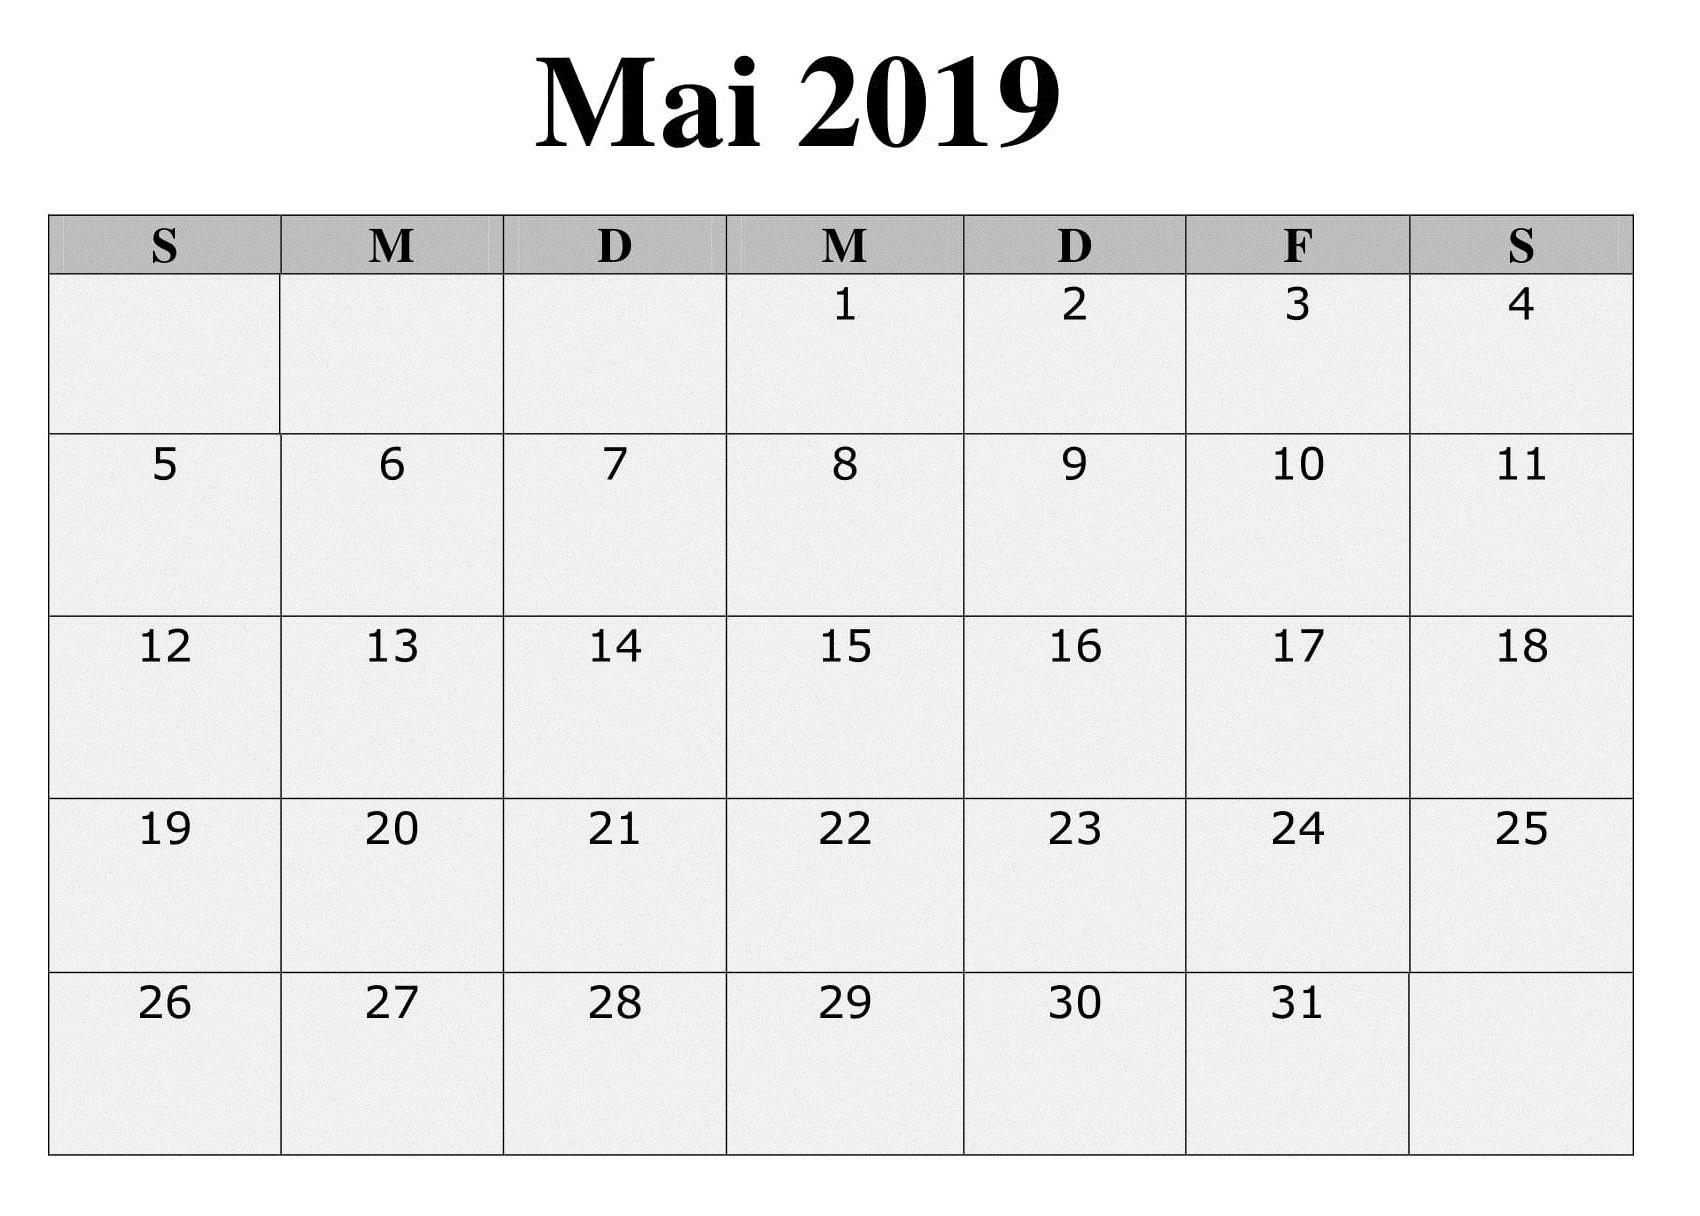 Calendario 2019 Imprimir A4 Más Populares 2019 Kalender Mai Zum Ausdrucken Planer Of Calendario 2019 Imprimir A4 Más Arriba-a-fecha C³mo Imprimir Un Calendario De Ipad 18 Pasos